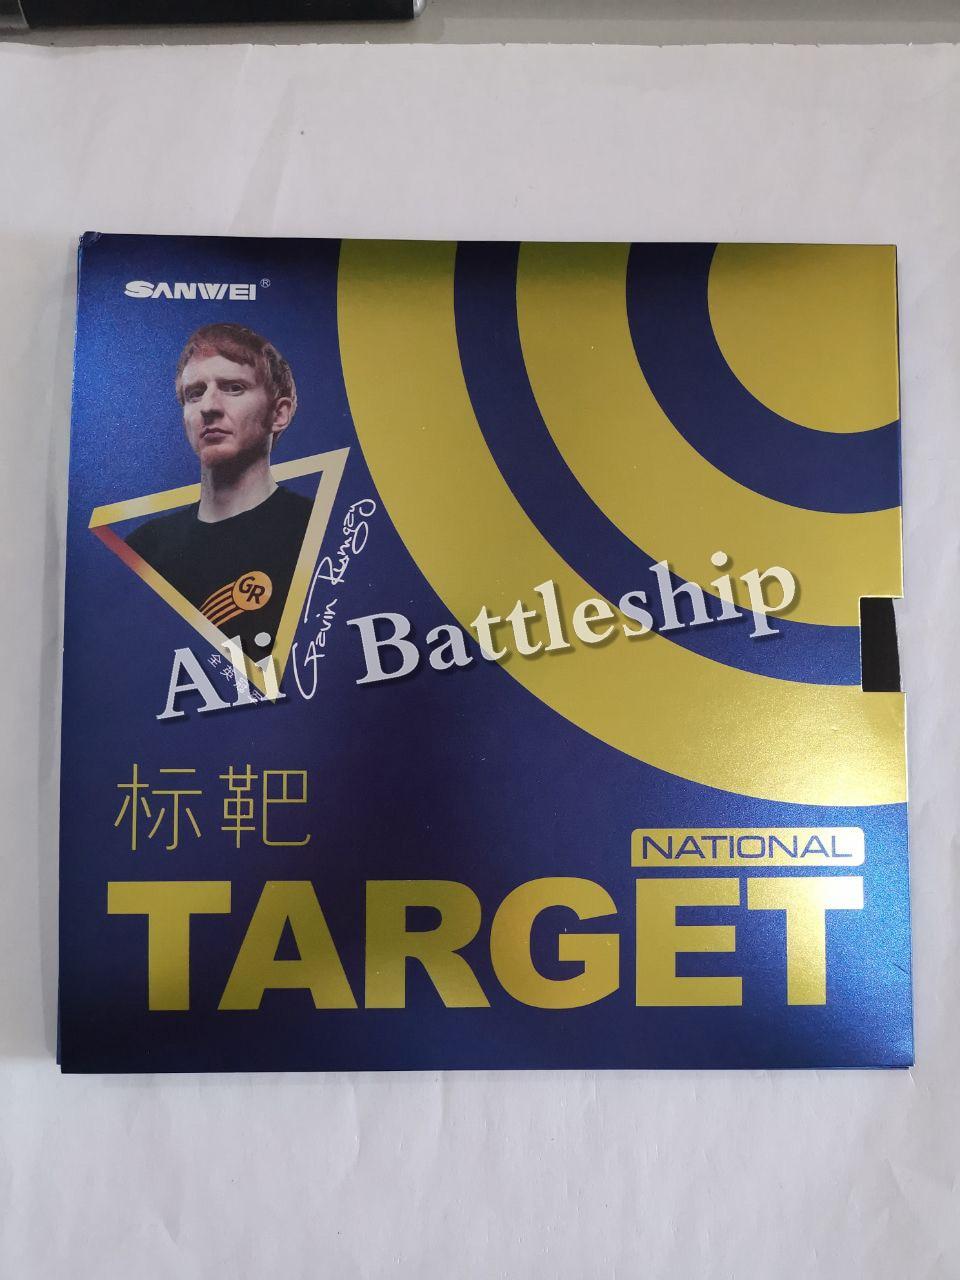 Original Sanwei TARGET (National) Pips-in Table Tennis Rubber (Blue Sponge)